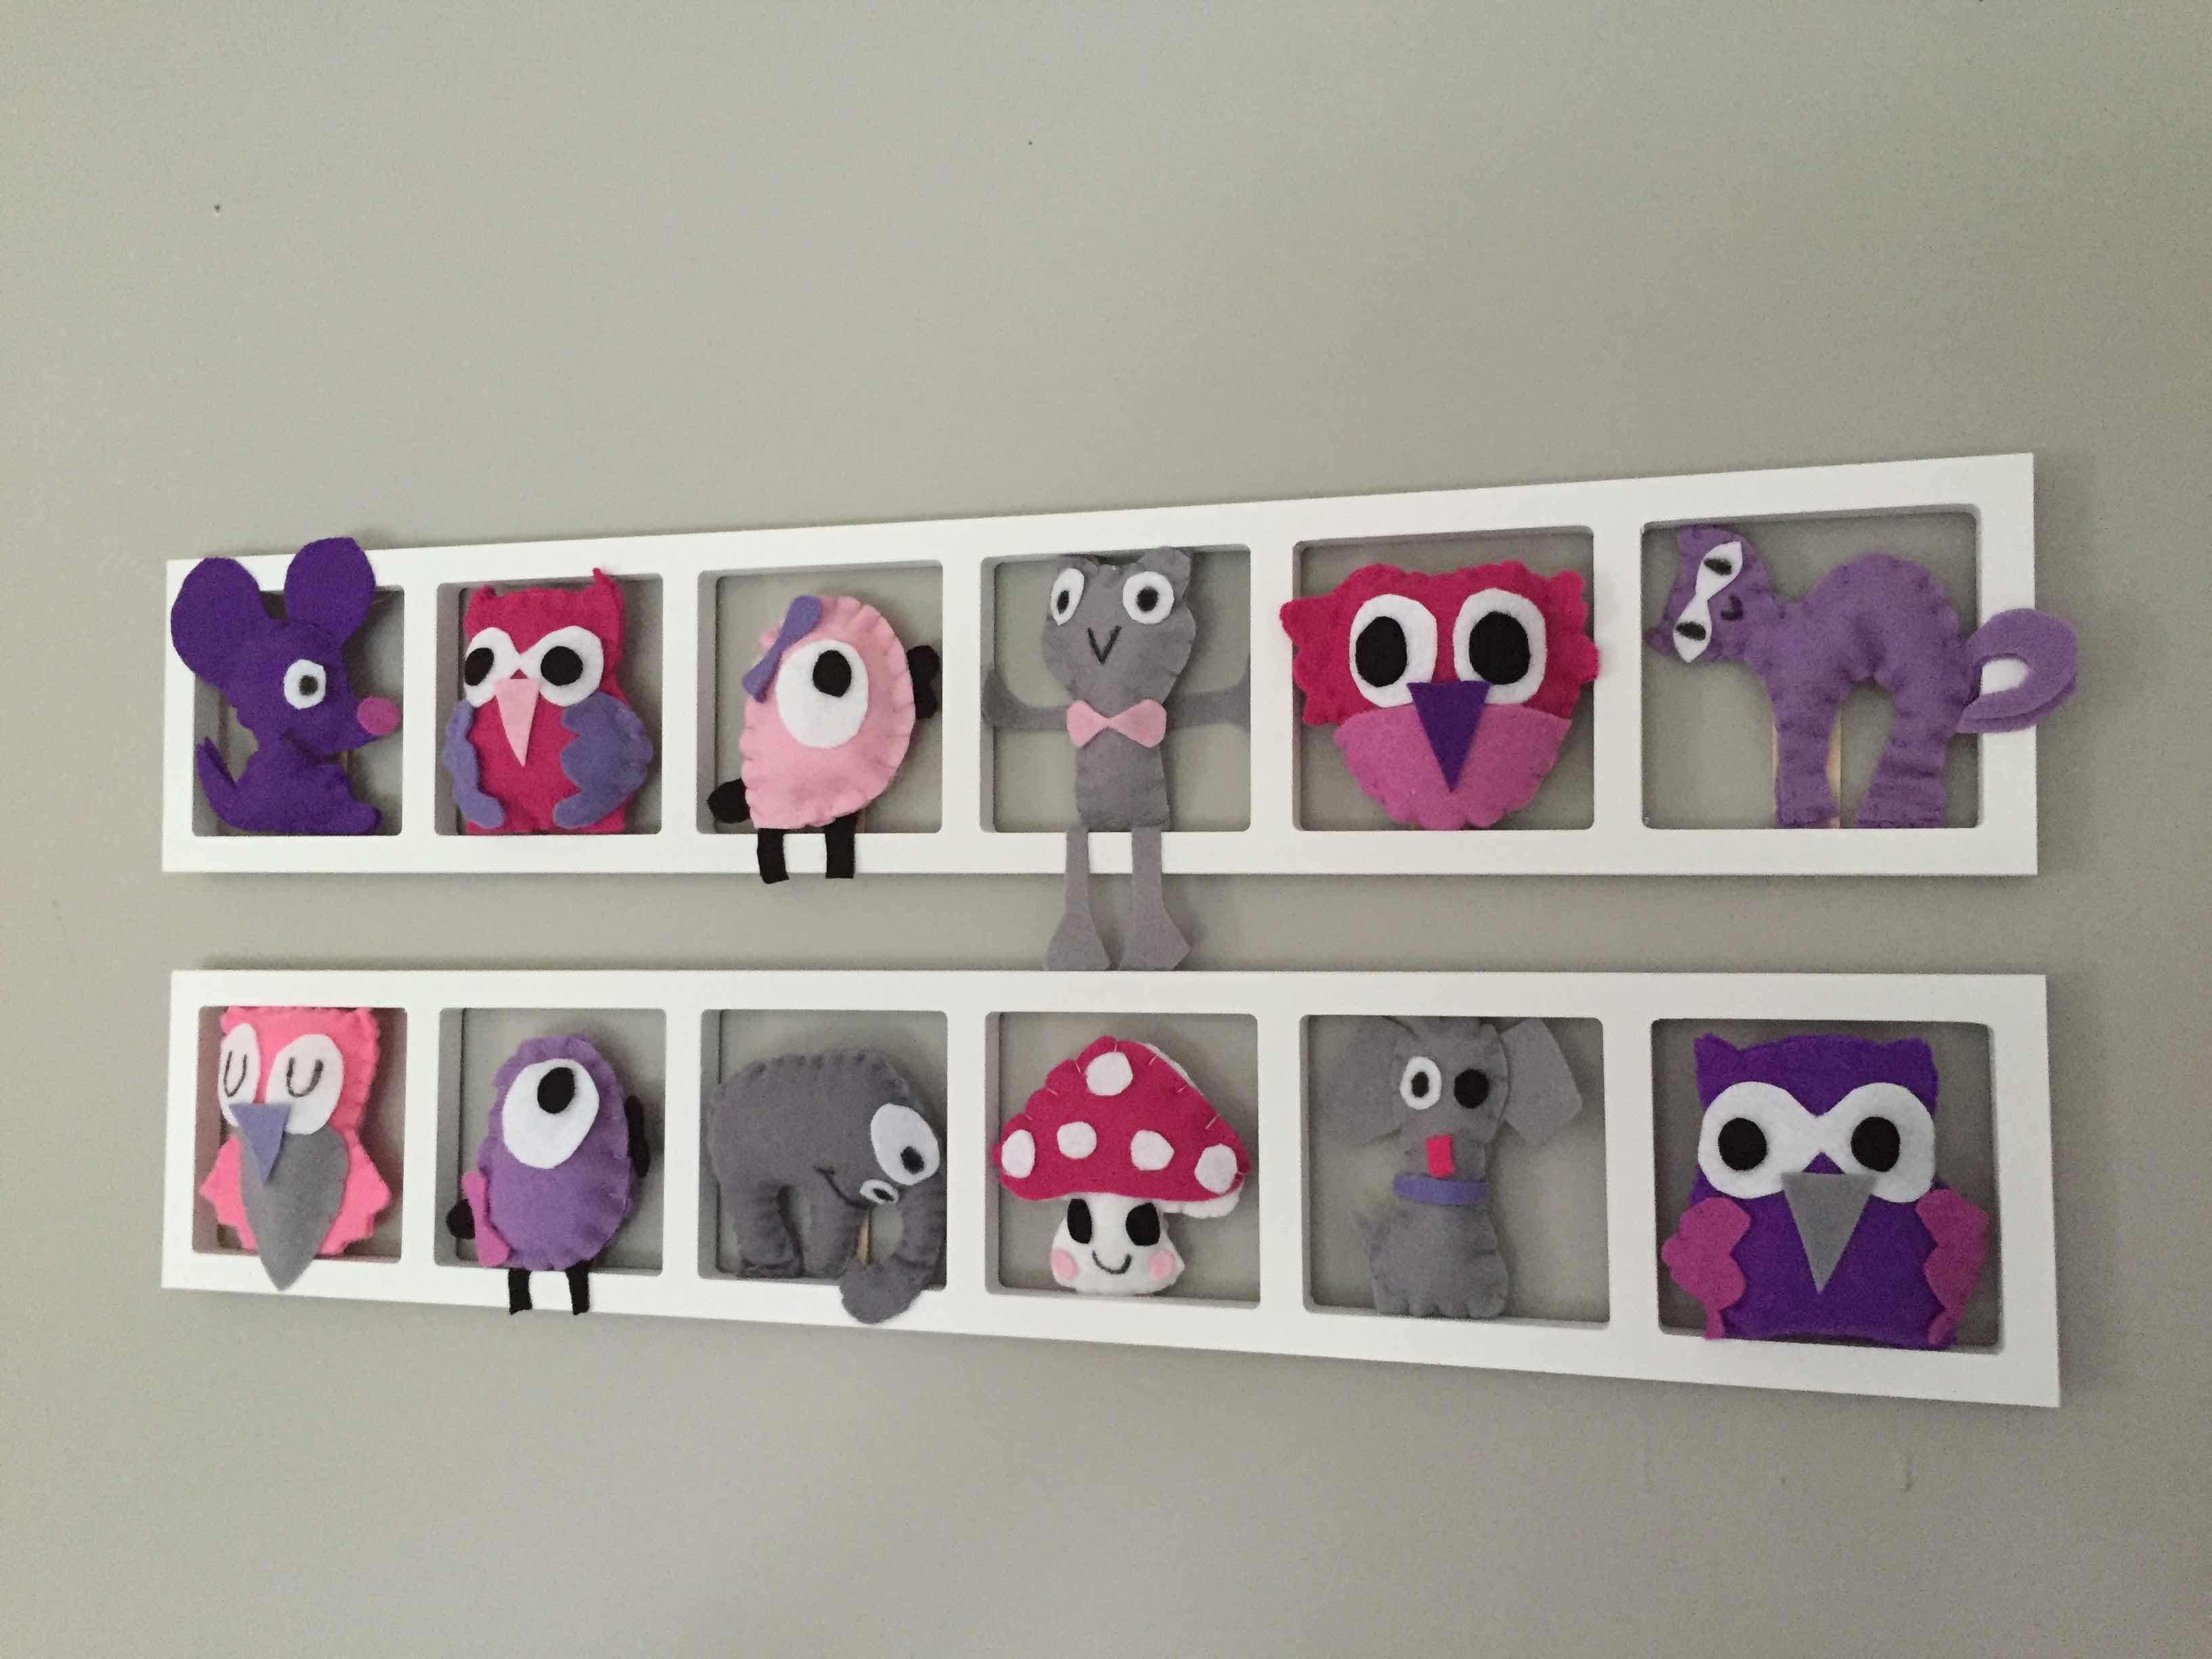 Deco Chambre Fille Fushia Et Gris deco murale « purply», tons gris fushia lila mauve, bichat 105